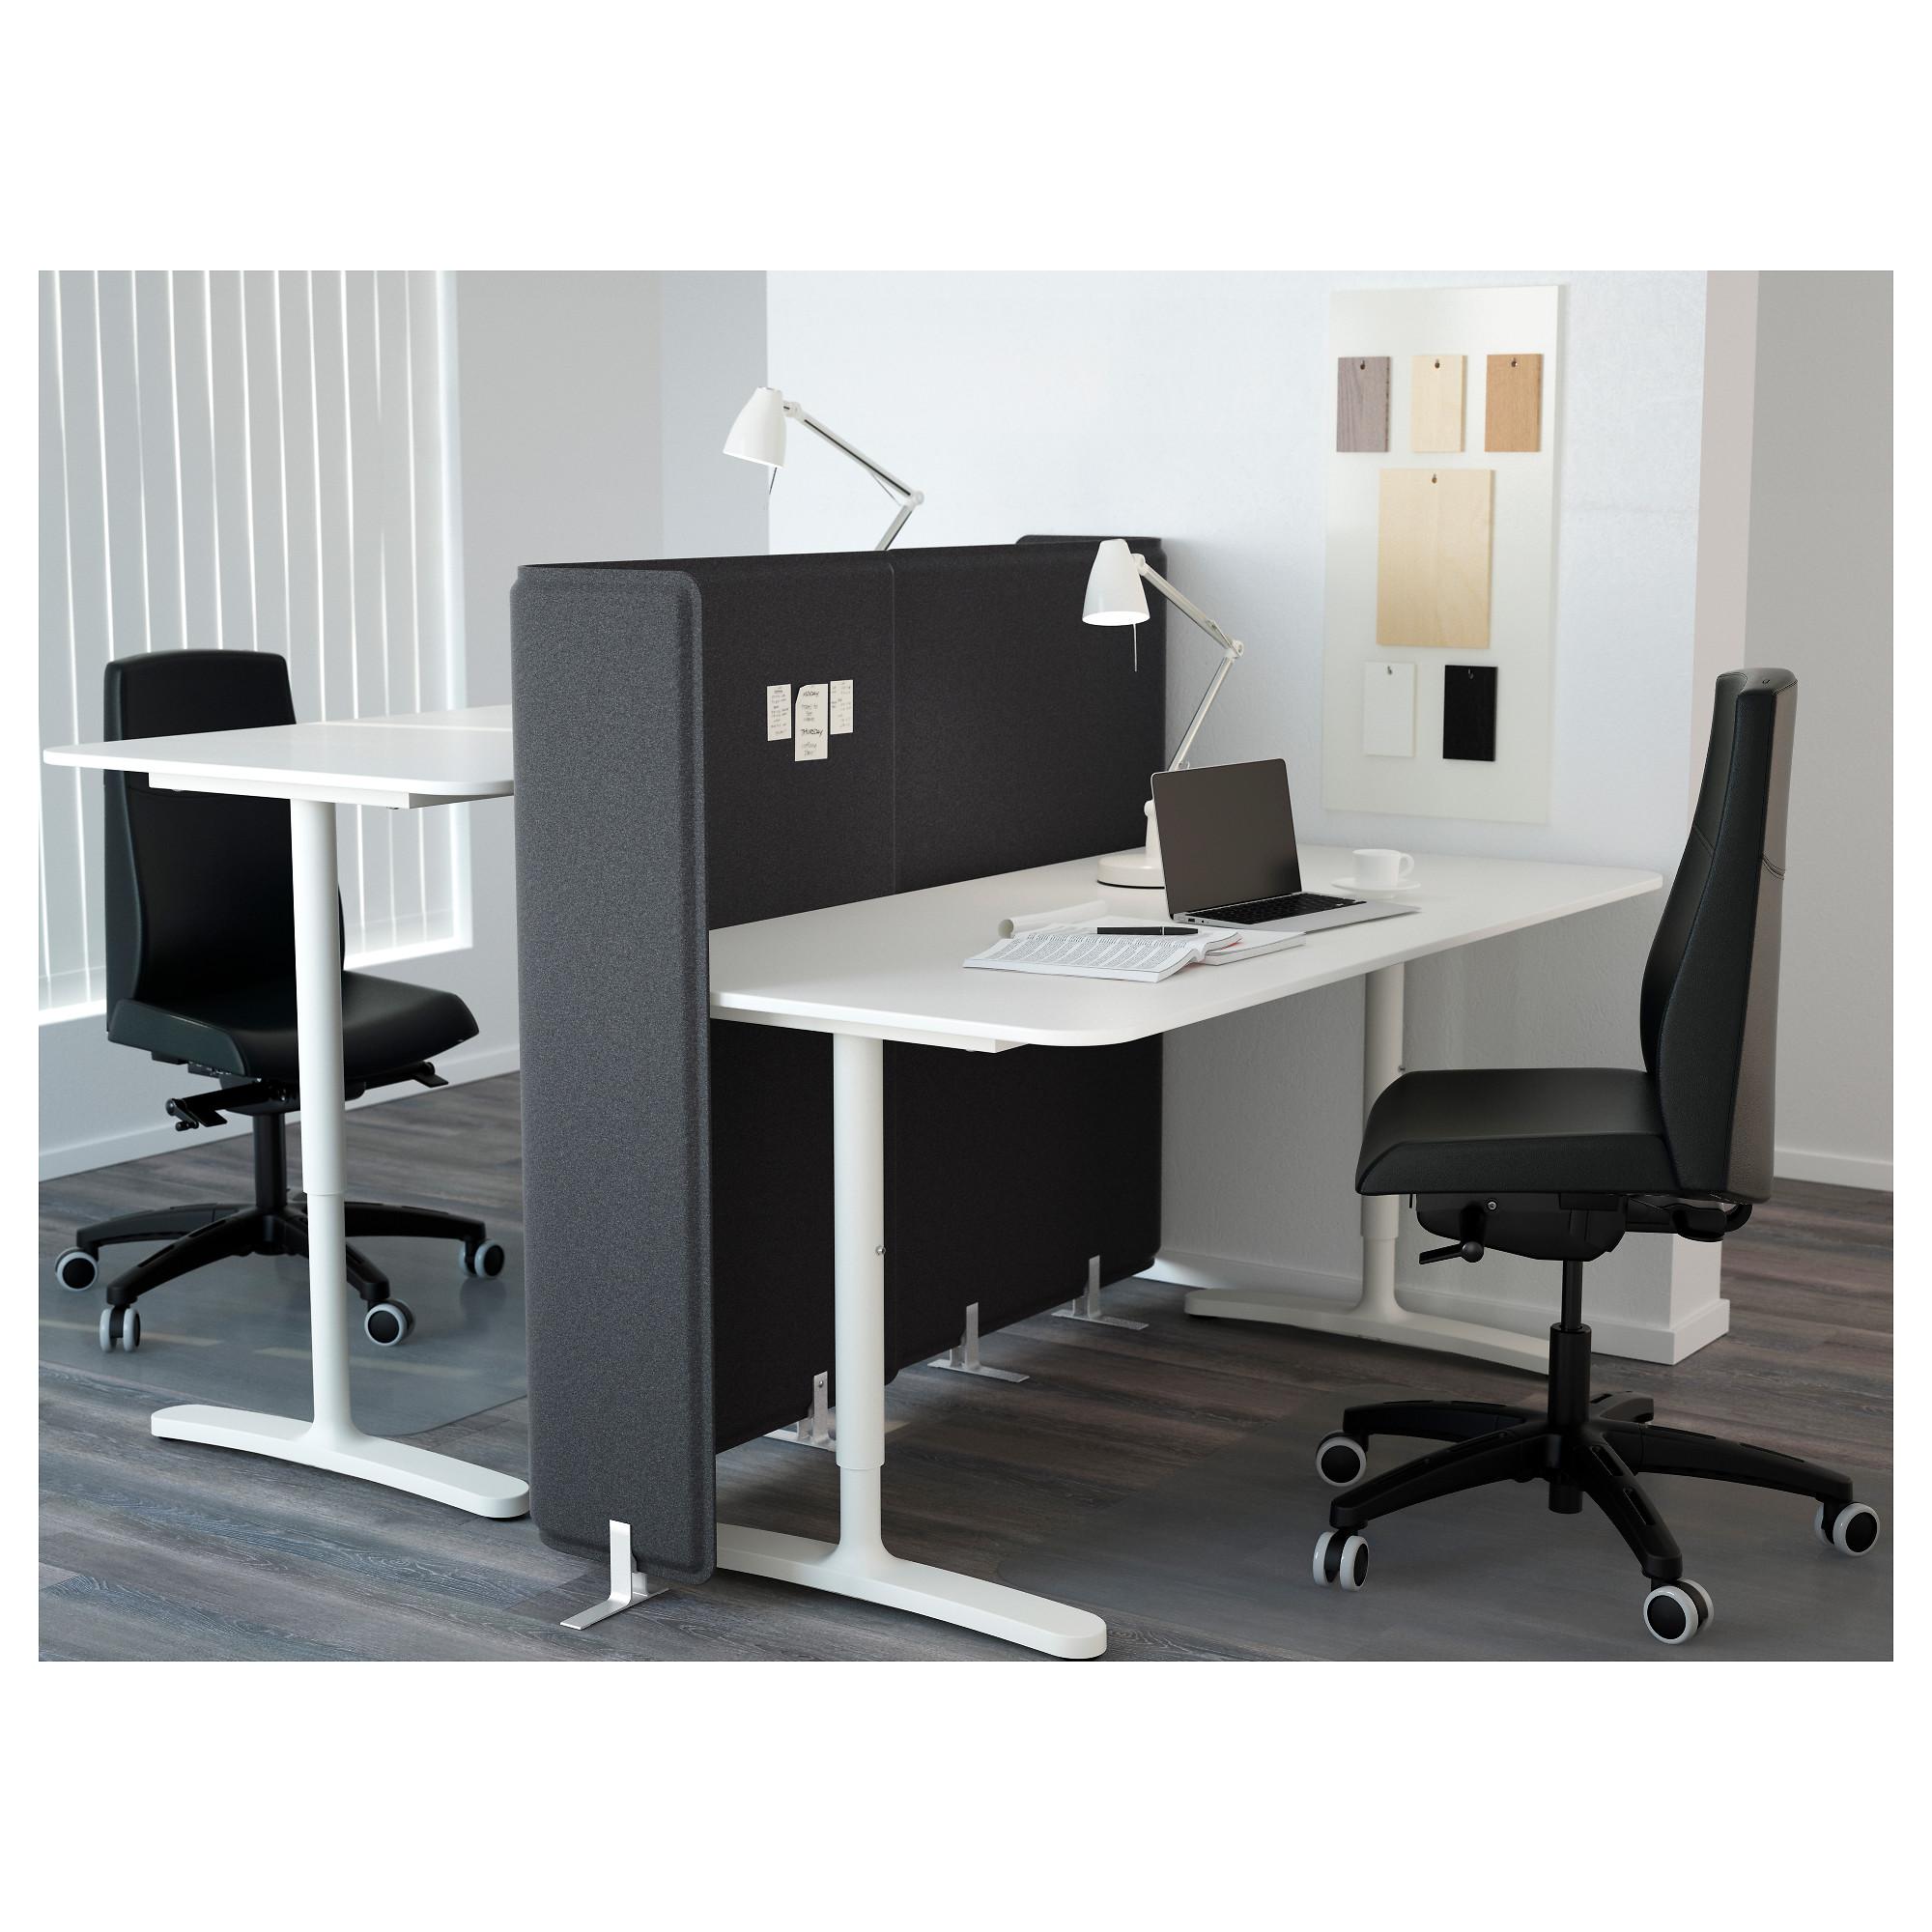 BEKANT Desk with screen, white, 160x160 120 cm